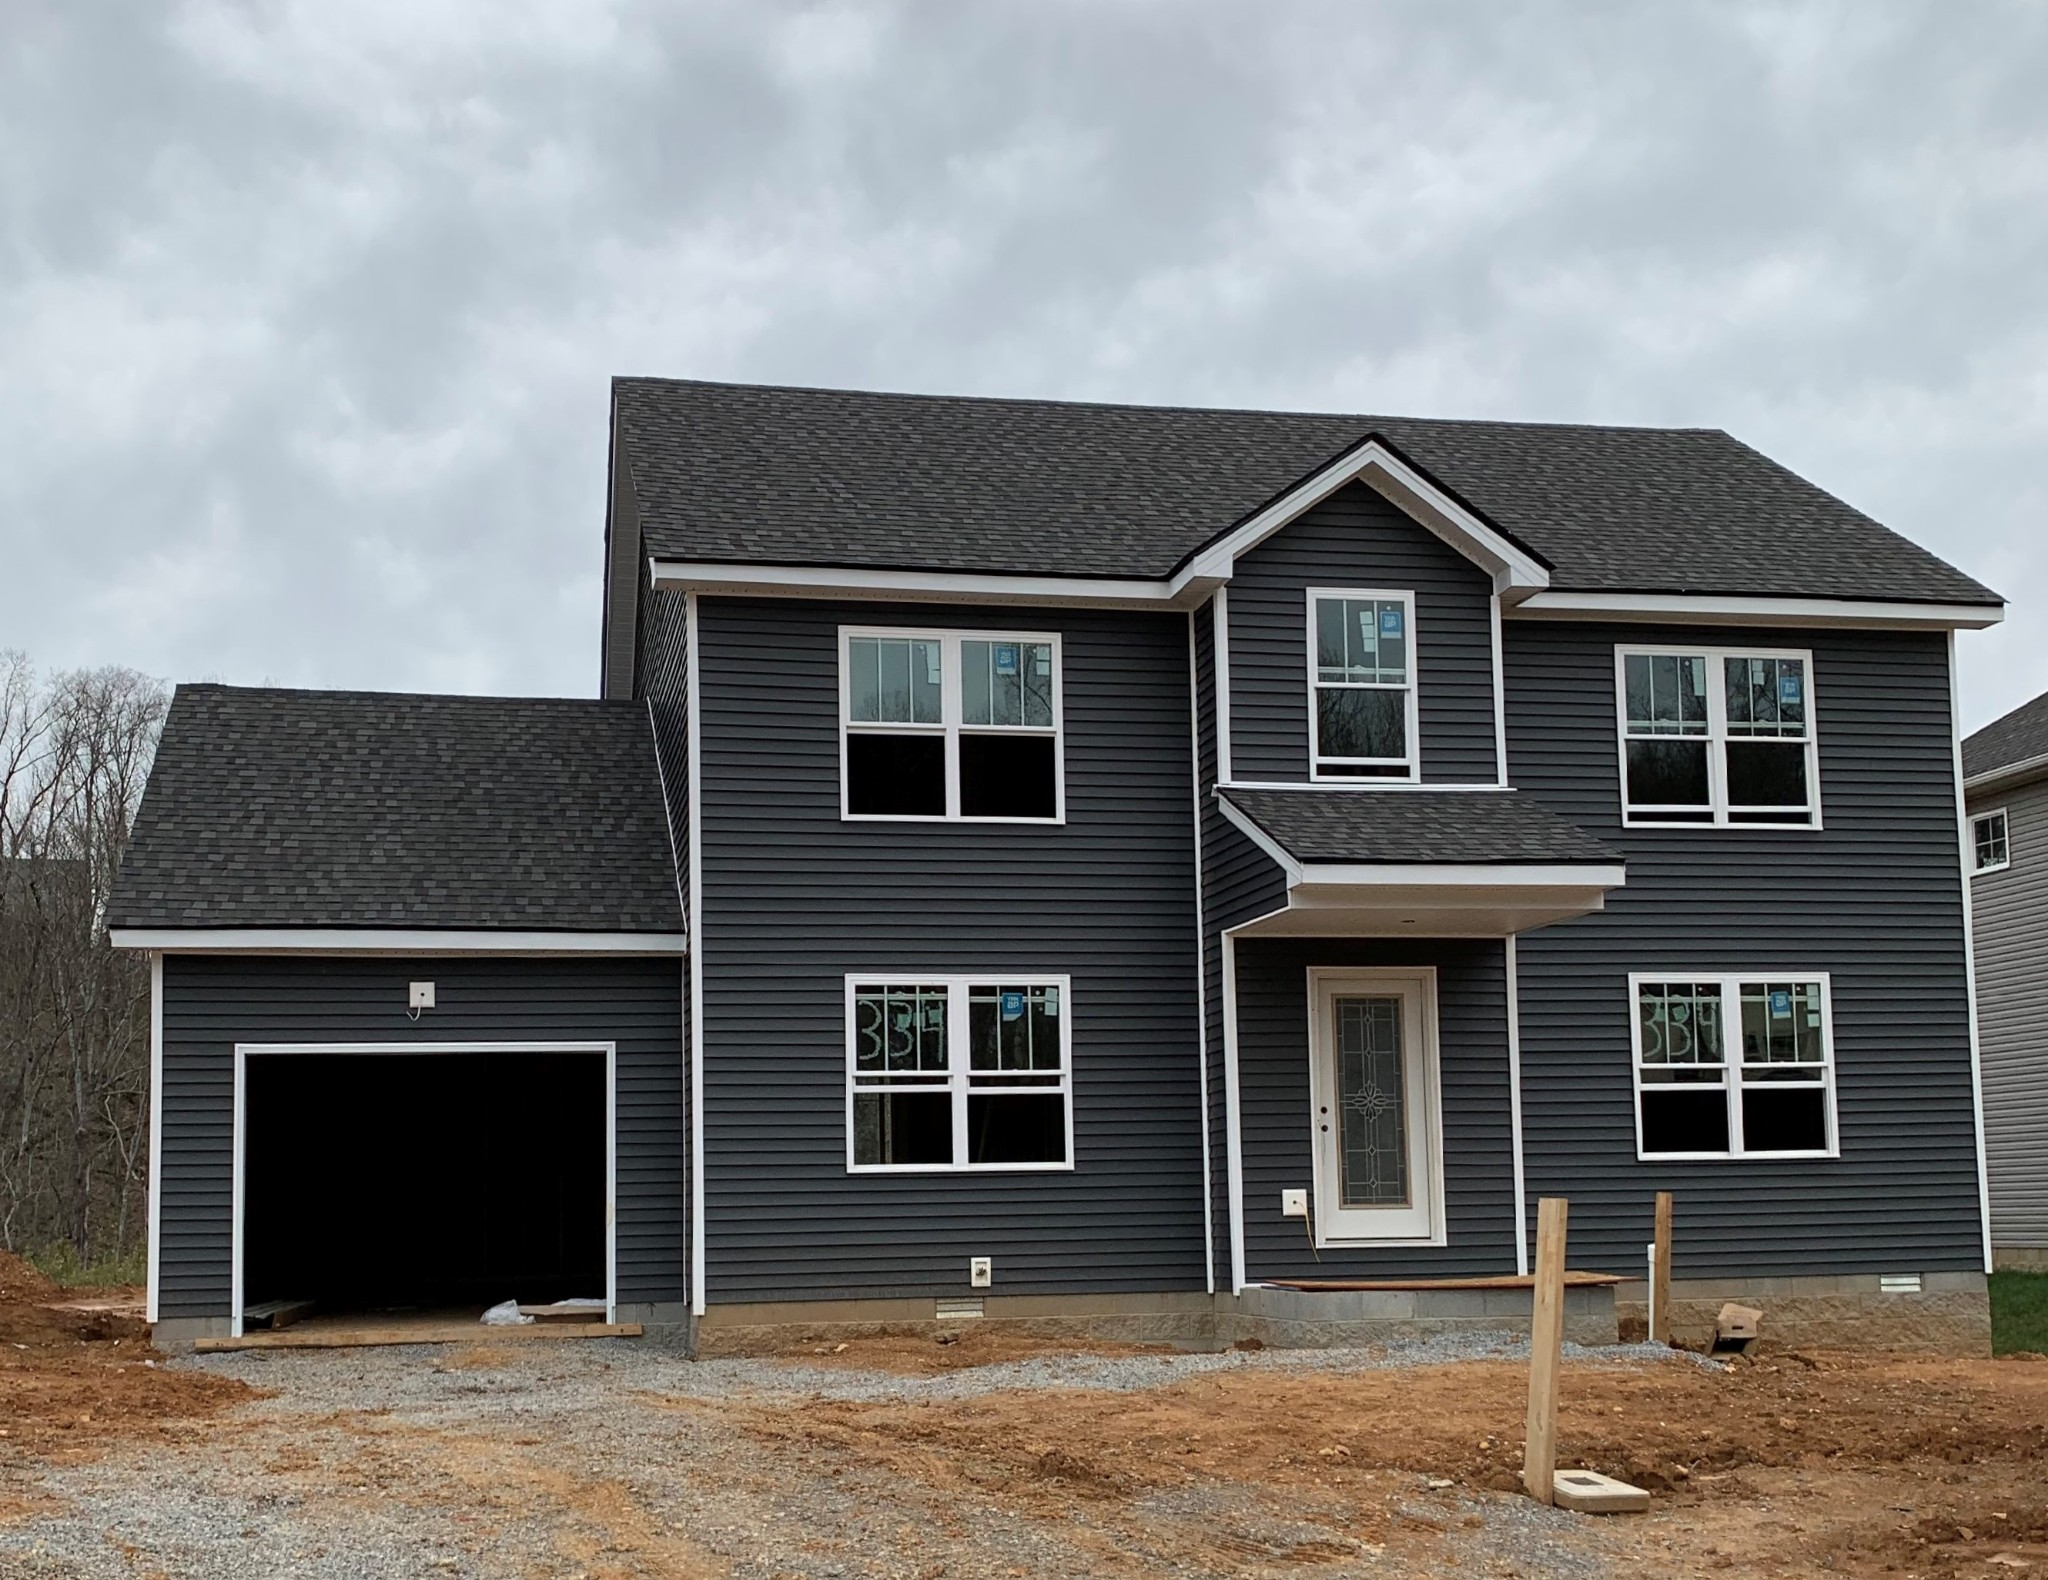 1681 Rains Rd, Clarksville, TN 37042 - Clarksville, TN real estate listing